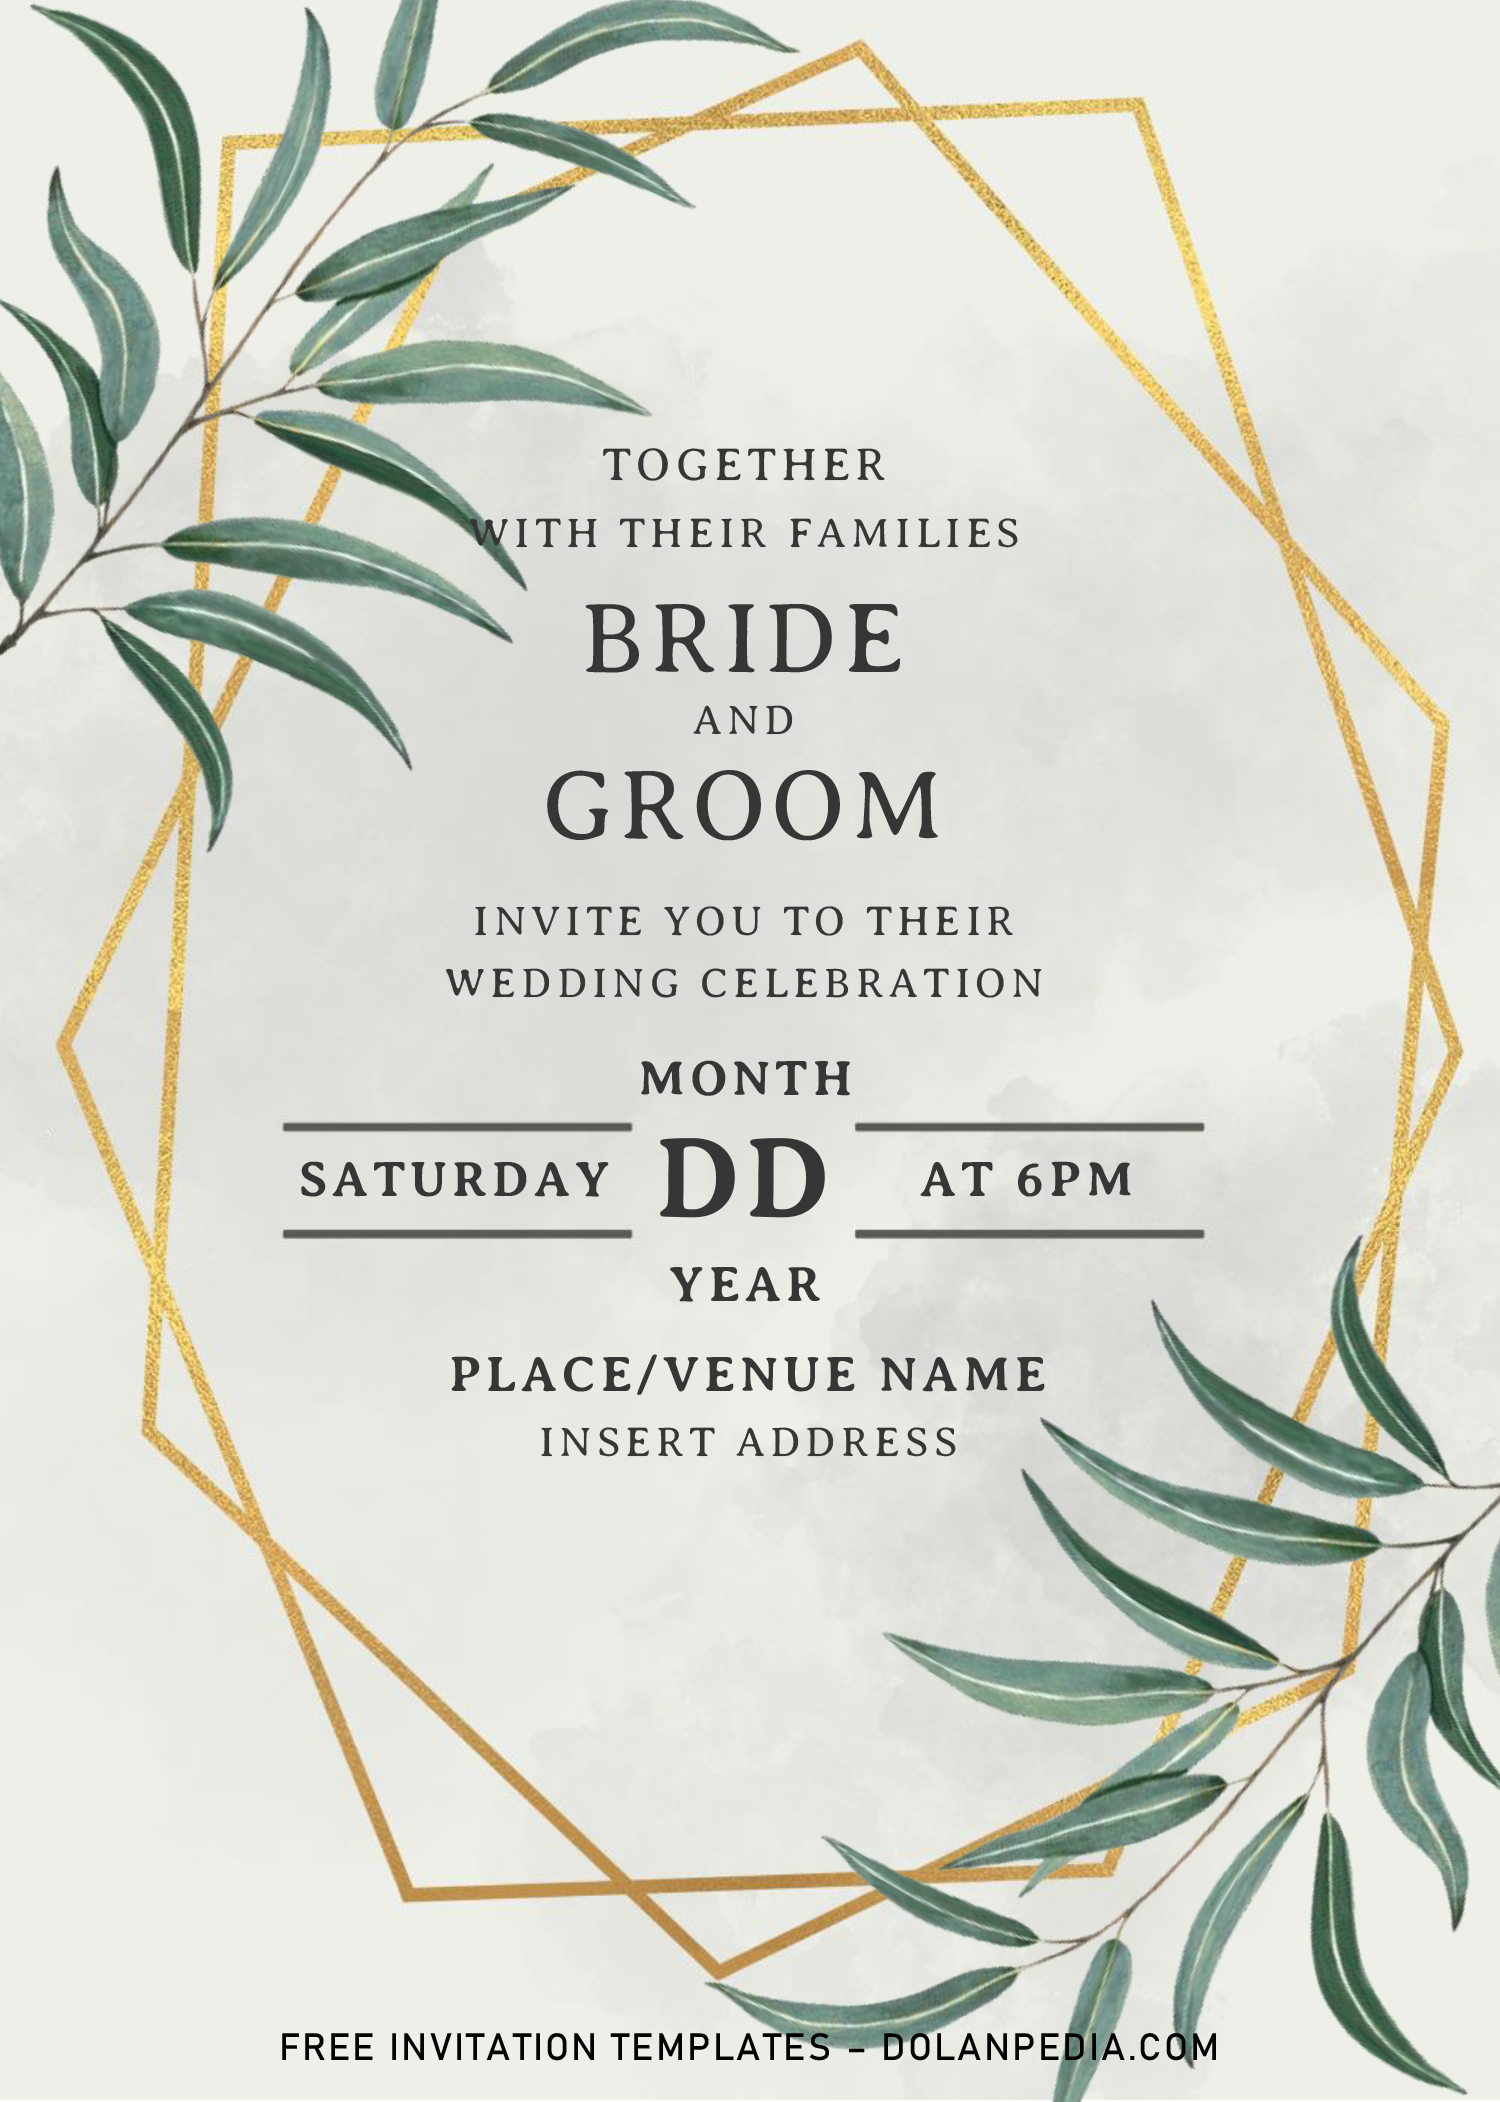 Greenery Geometric Wedding Invitation Templates Editable With Ms Word Geometric Wedding Invitation Wedding Invitation Templates Geometric Wedding - ms word wedding invitation templates